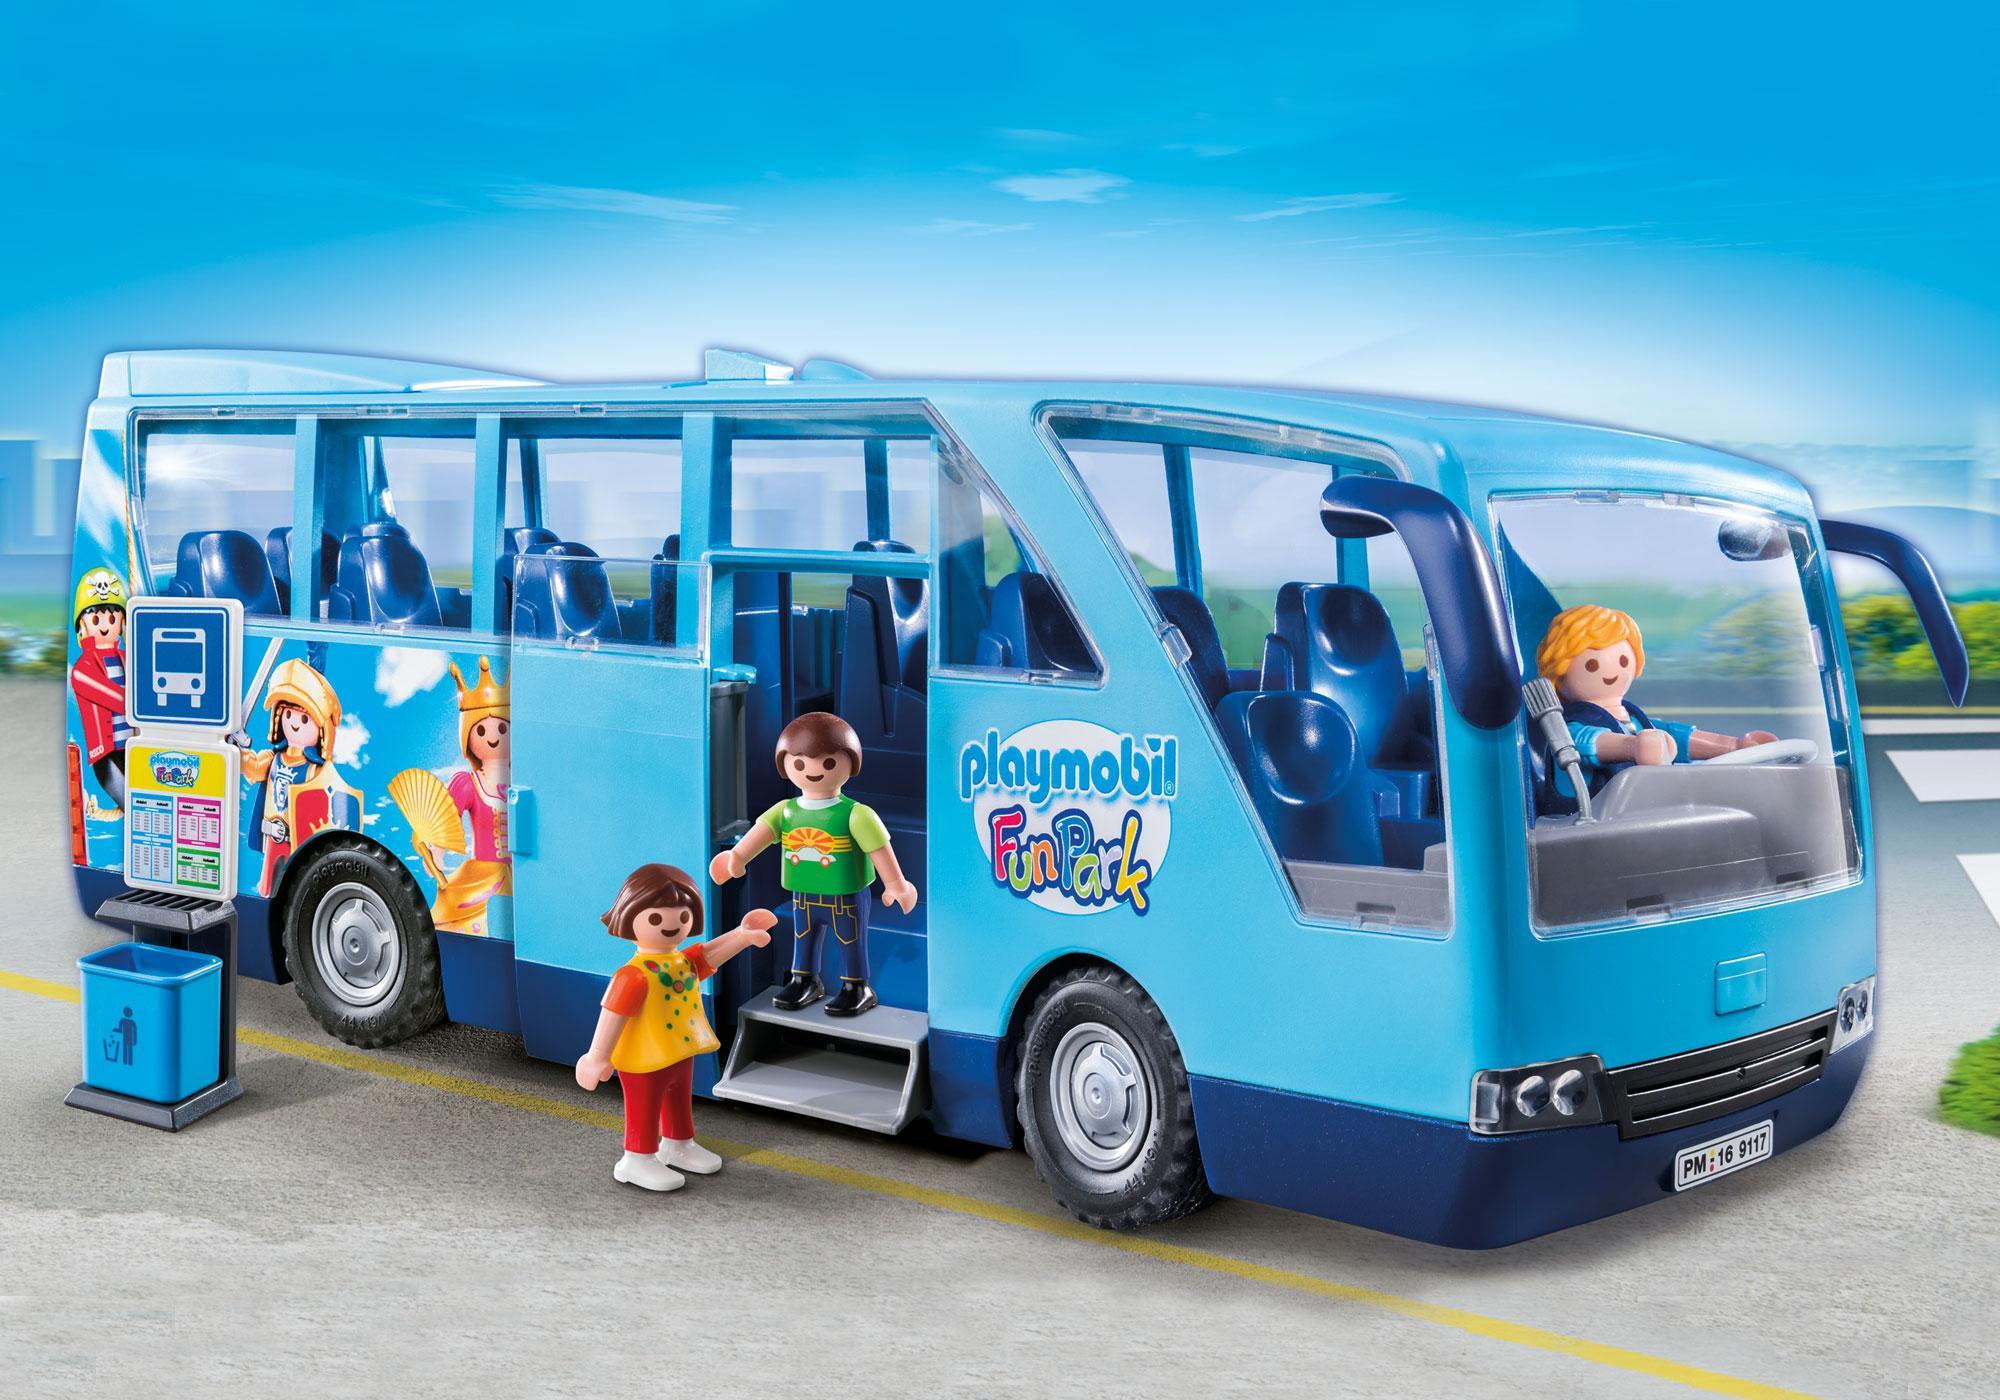 9117_product_detail/PLAYMOBIL-FunPark Bus navetta